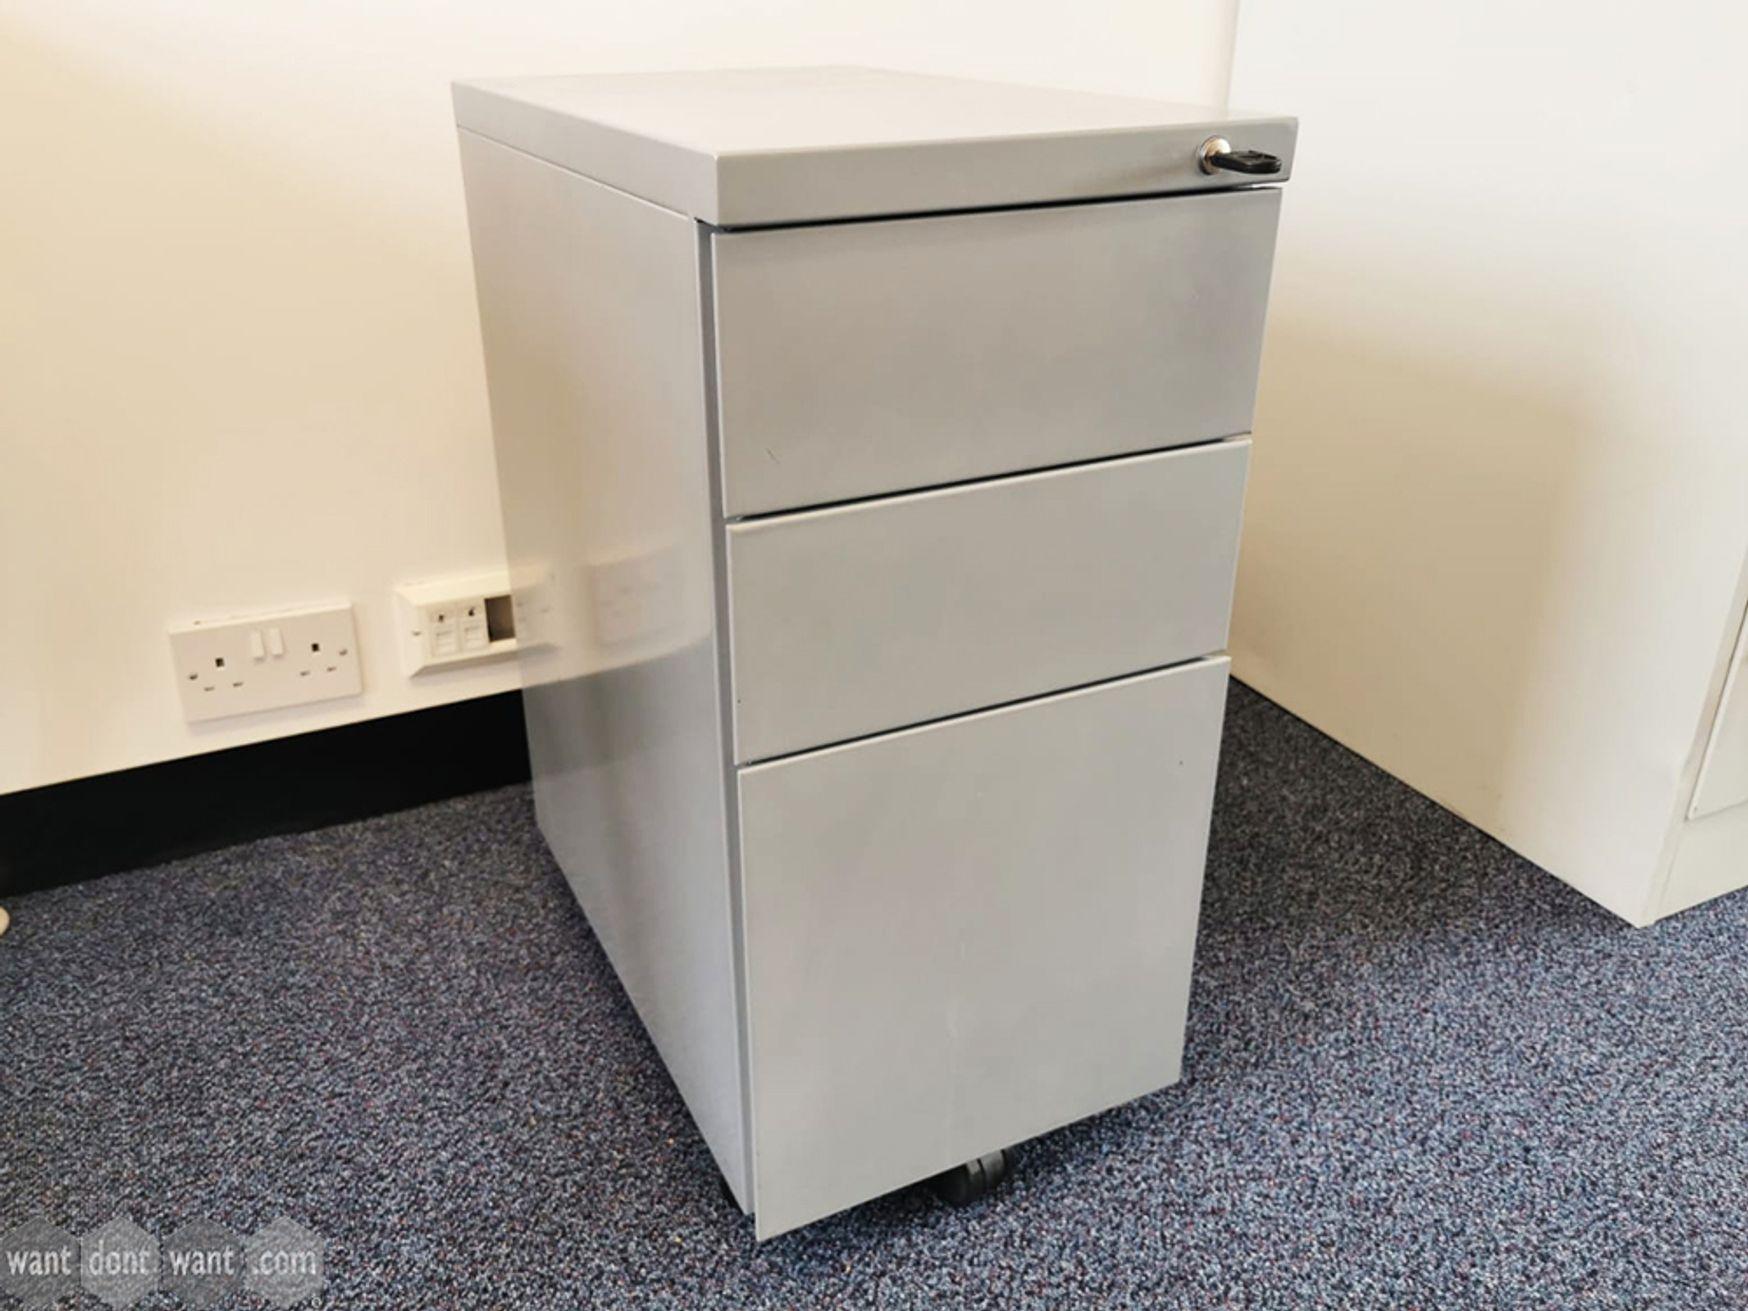 Used Slim Under Desk 3 drawer Pedestals